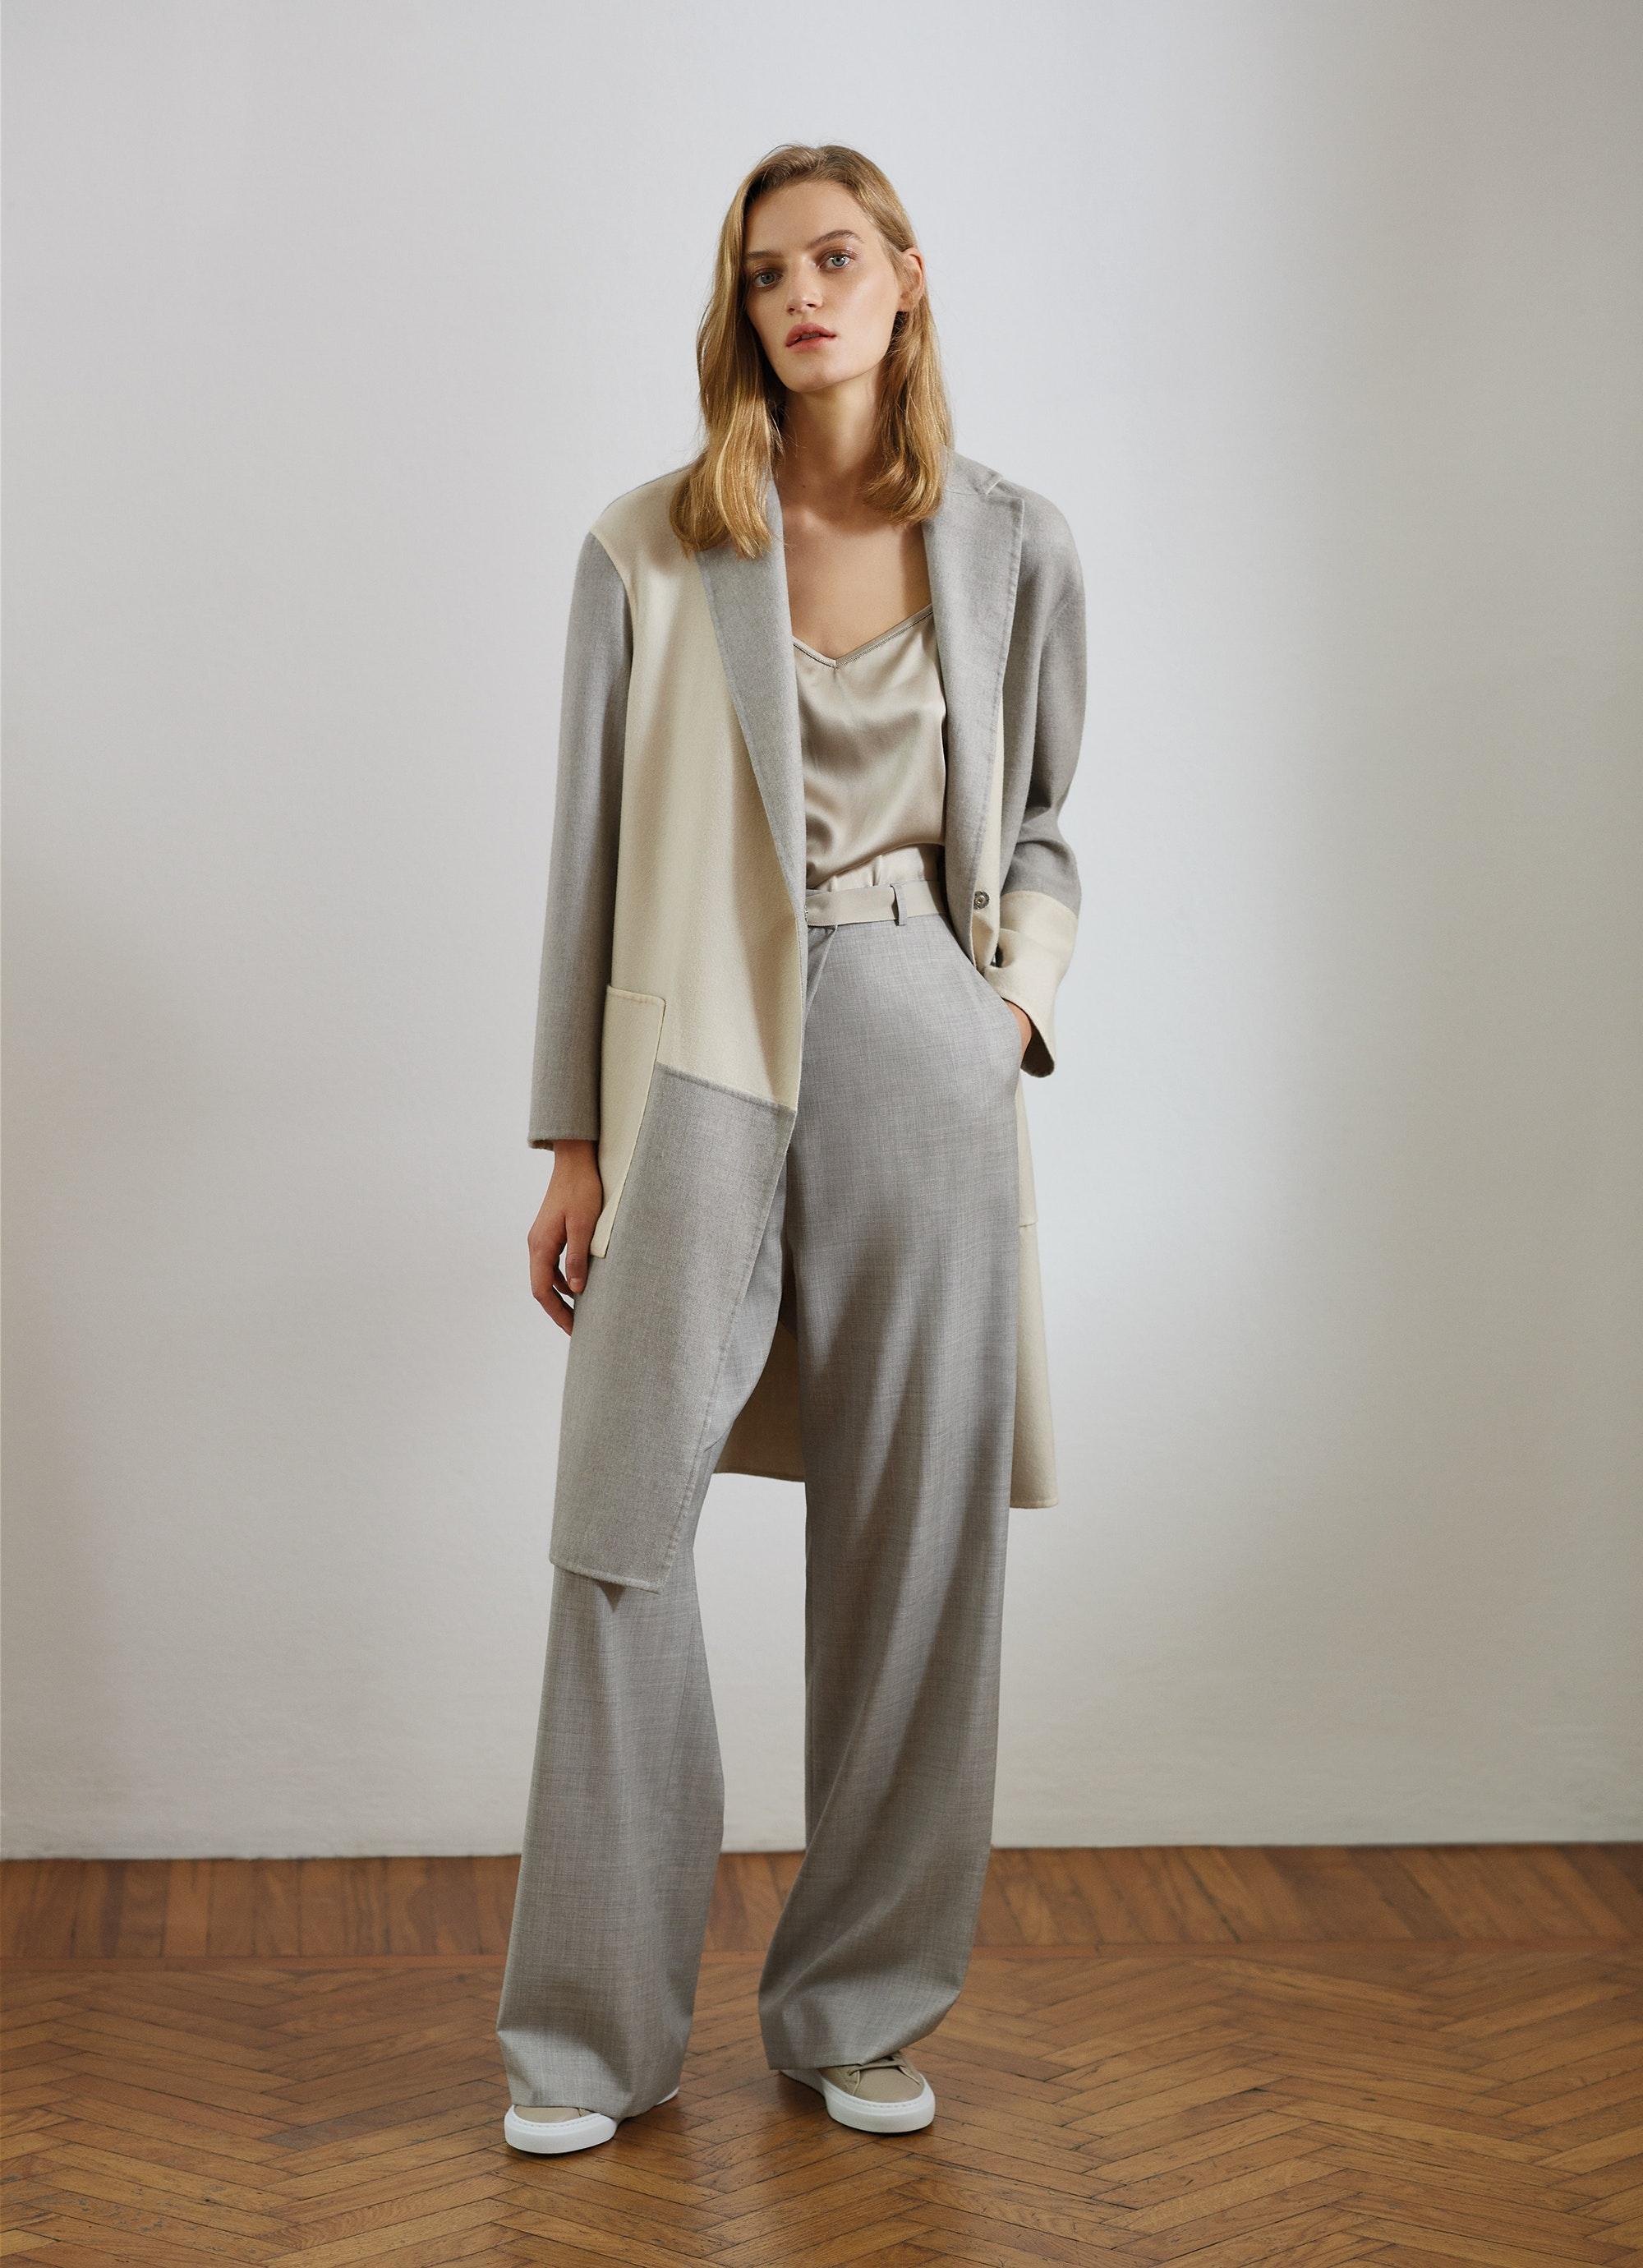 Fabiana Filippi, Spring Looks 2018, coat, Mäntle 2018, Lodenfrey, Munich